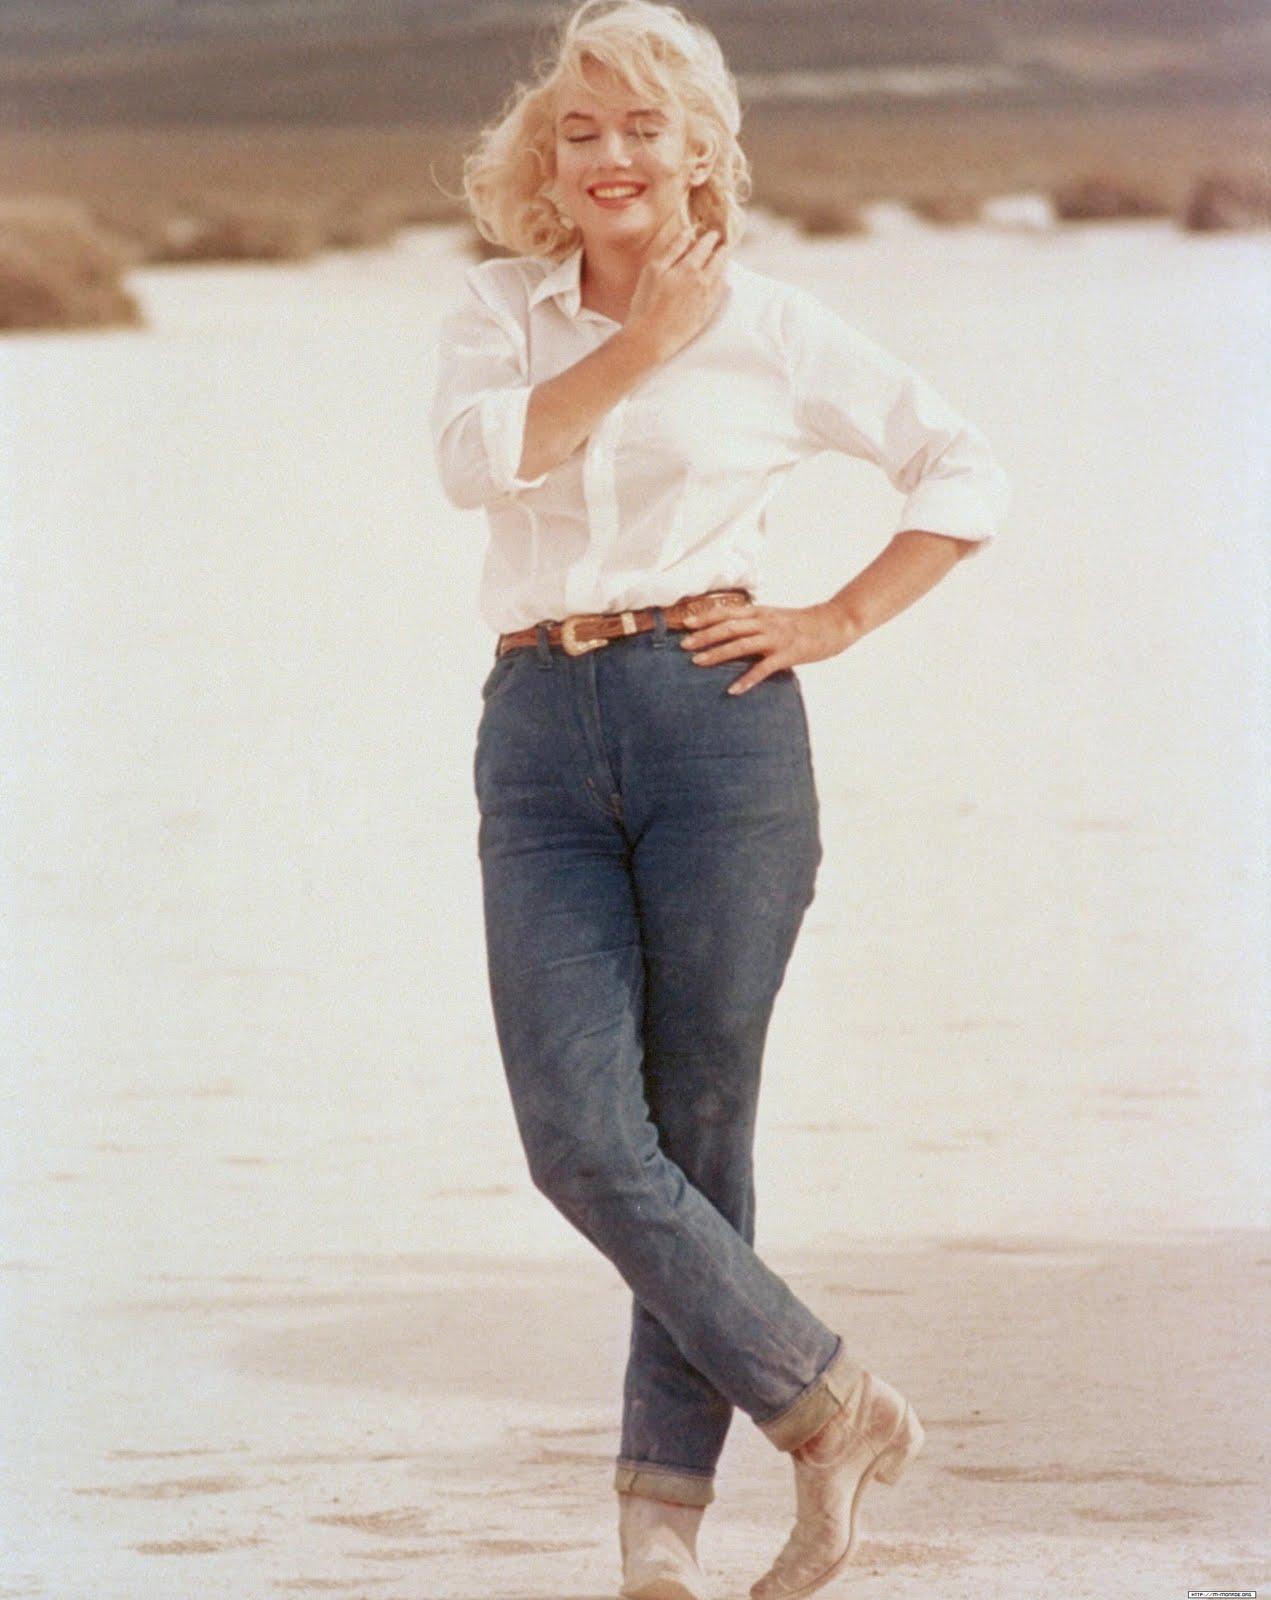 http://3.bp.blogspot.com/-iheiyfzQ_qY/T9vLR02ahqI/AAAAAAAAI-w/Xhiu0zsmJ08/s1600/Marilyn+Monroe+in+jeans.jpg